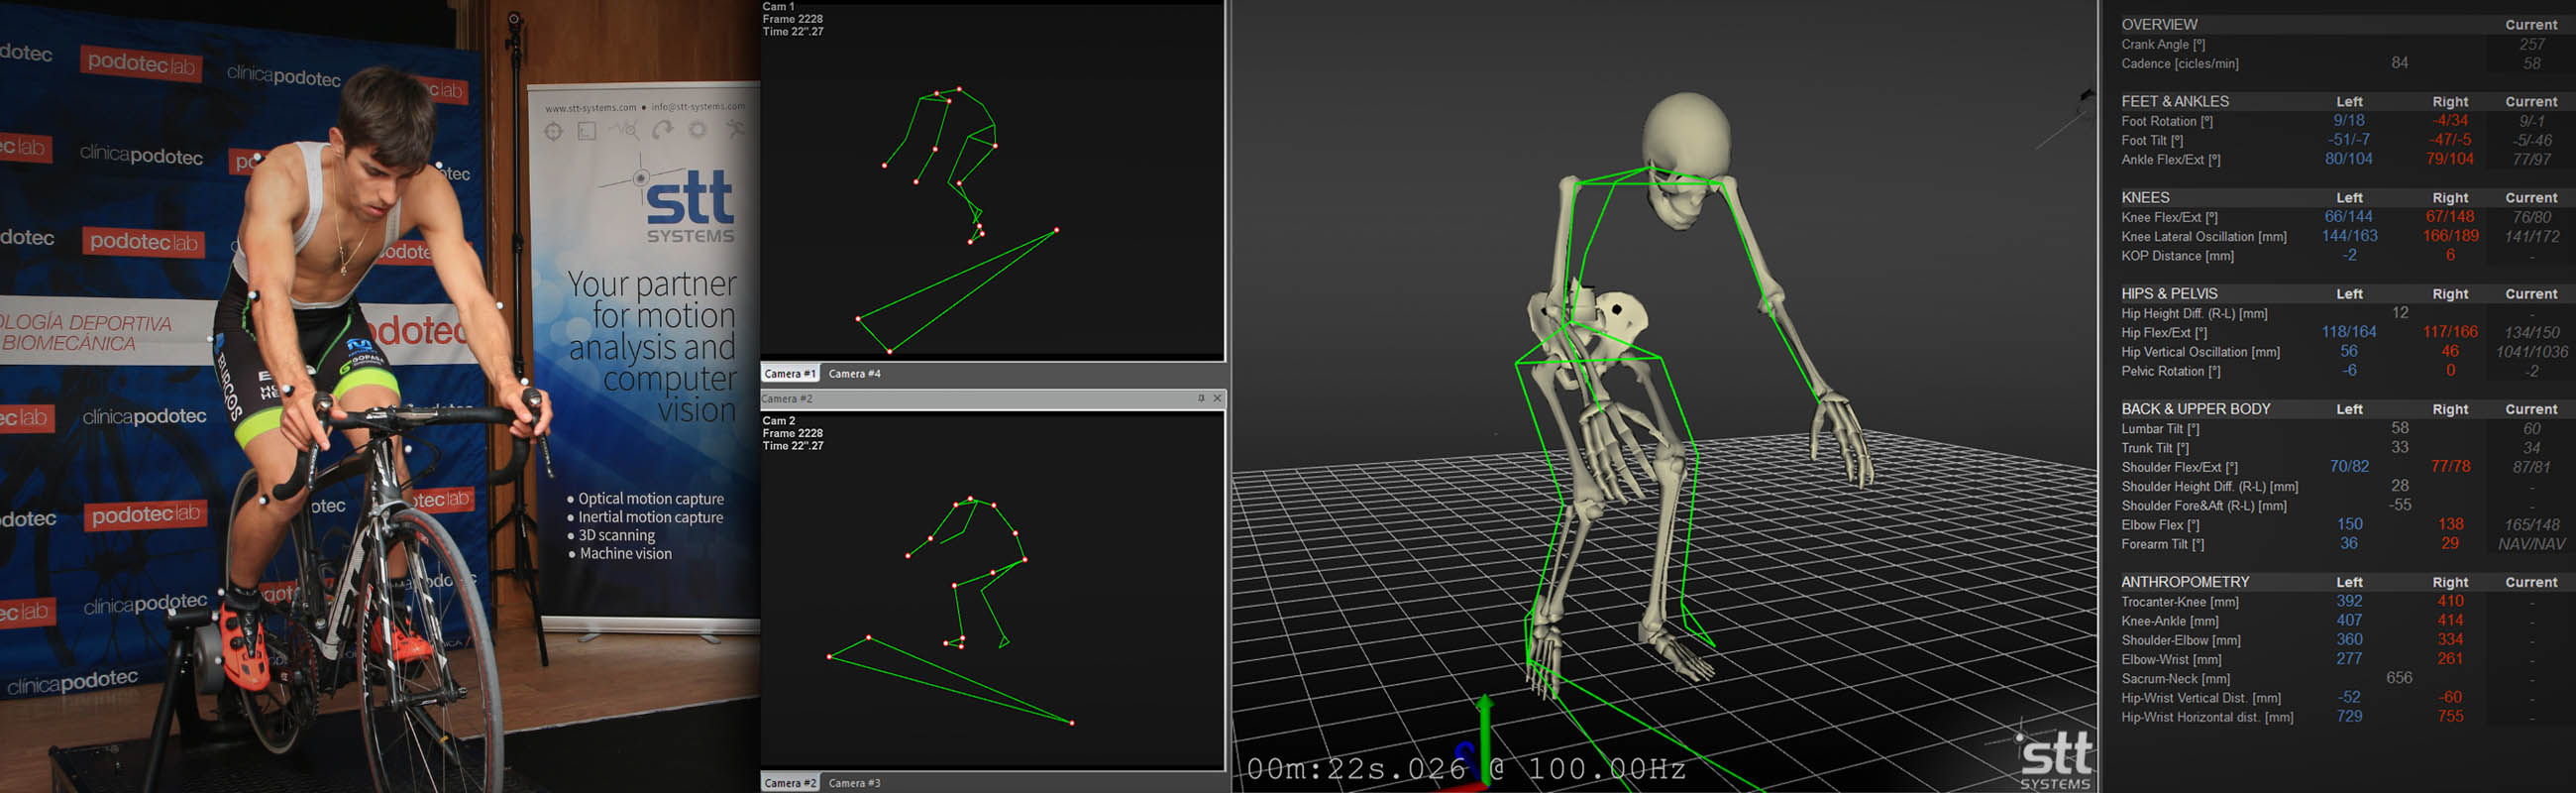 STT 3D Motion Capture System